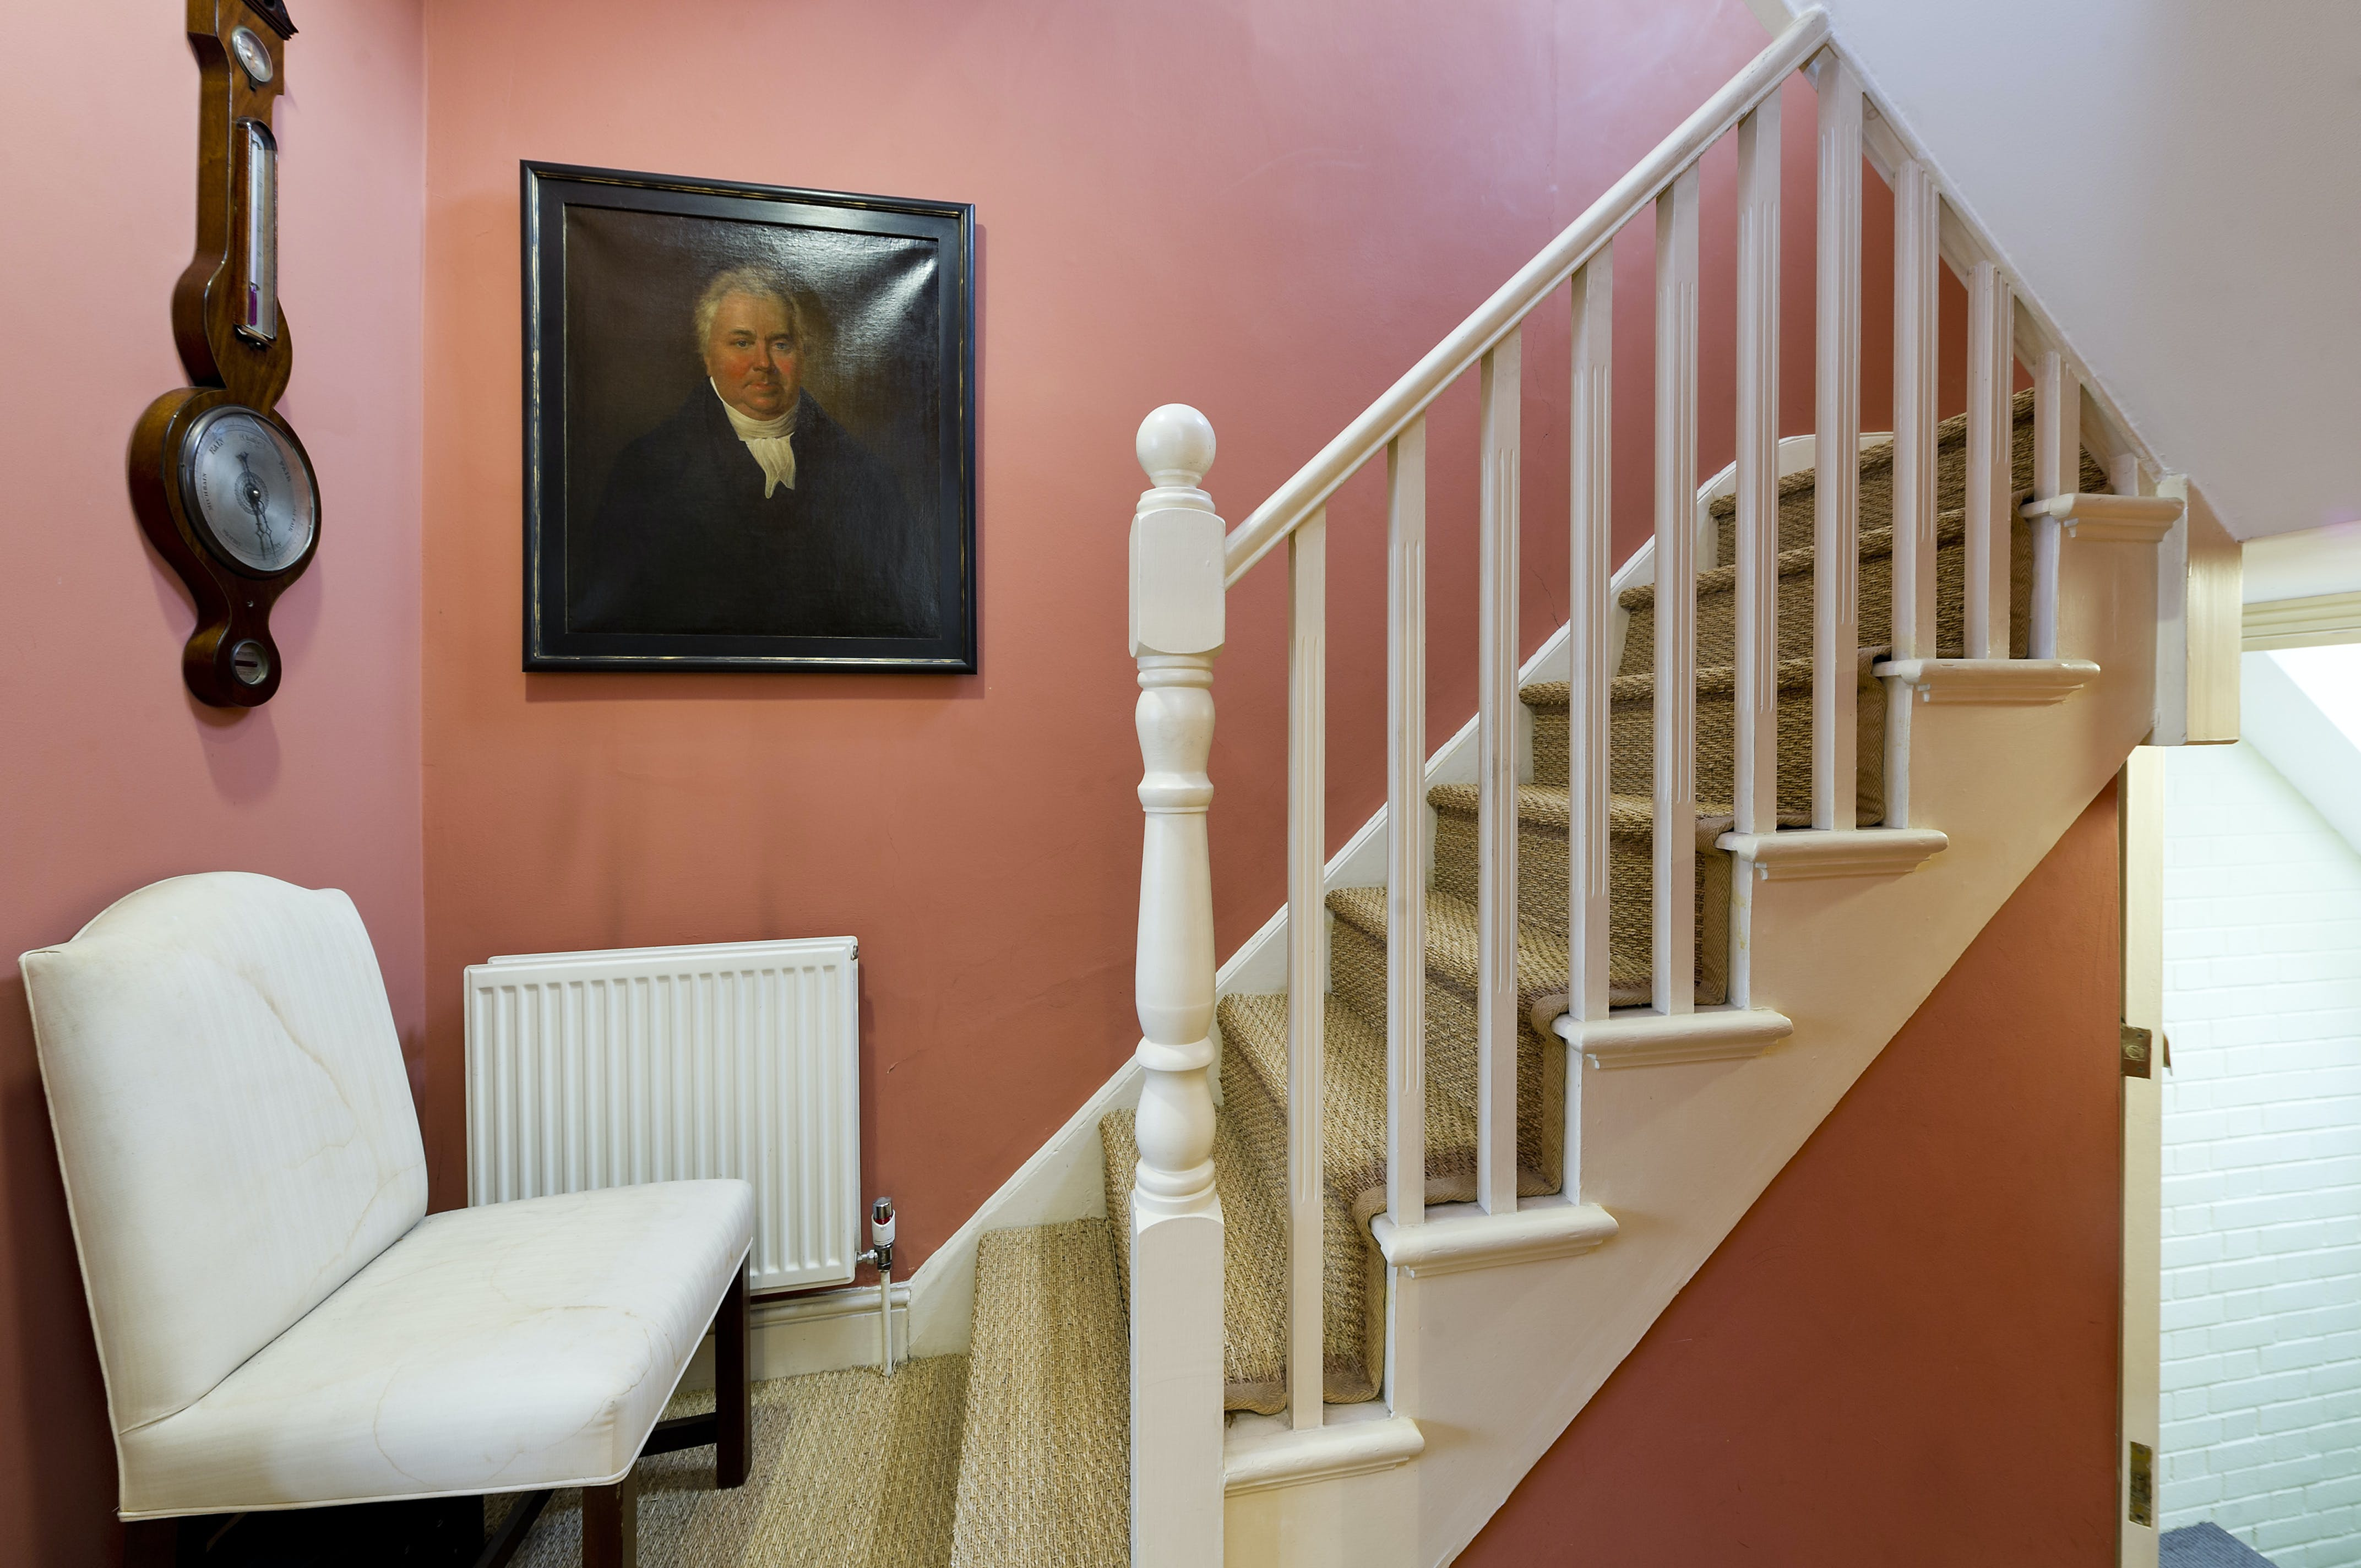 586 Kings Road, London, Office / Residential / Retail For Sale - 586 kings rd0420.jpg